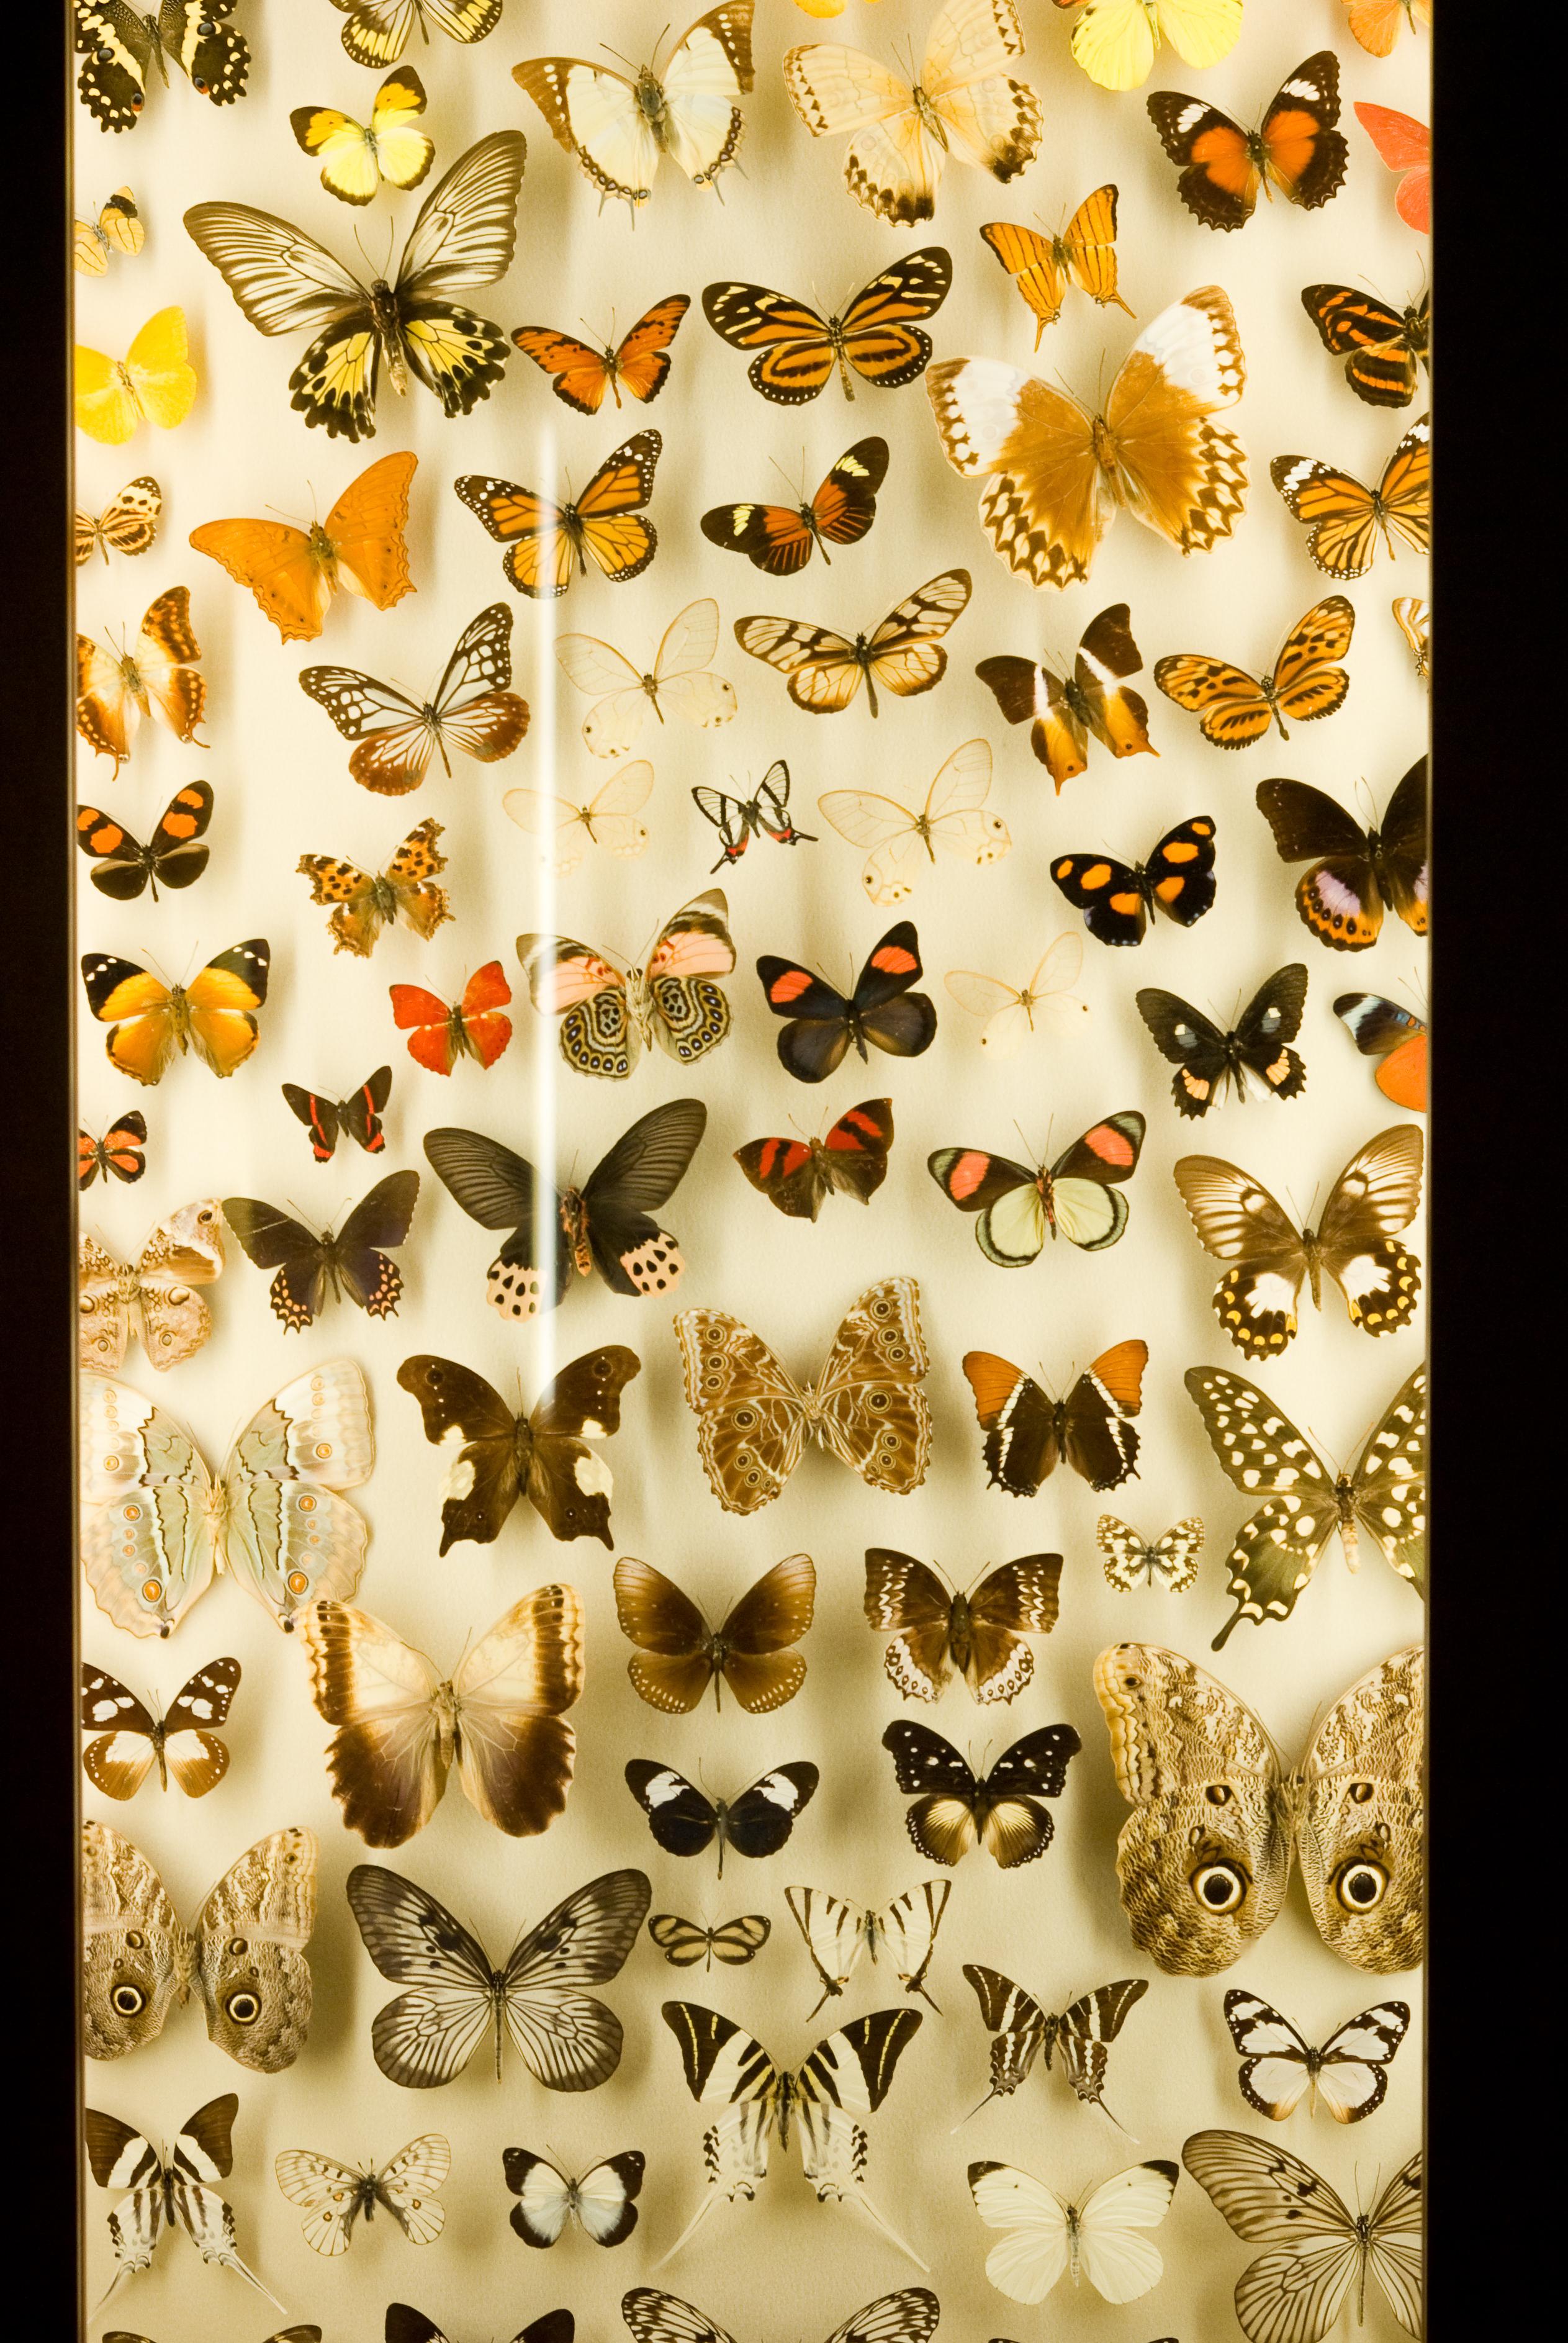 Insectarium   Nervous System blog